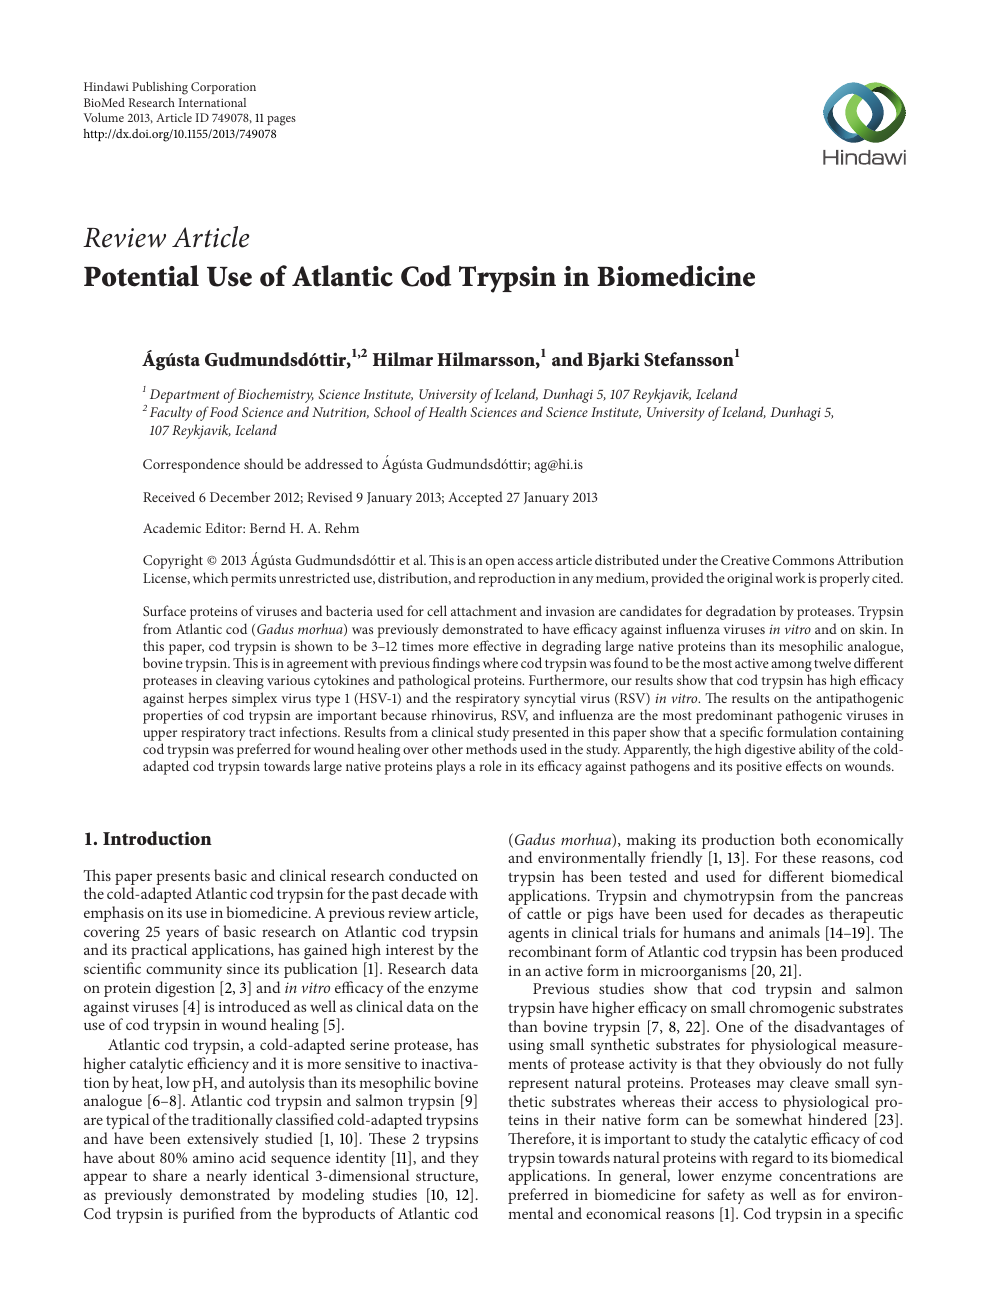 Potential Use of Atlantic Cod Trypsin in Biomedicine – topic